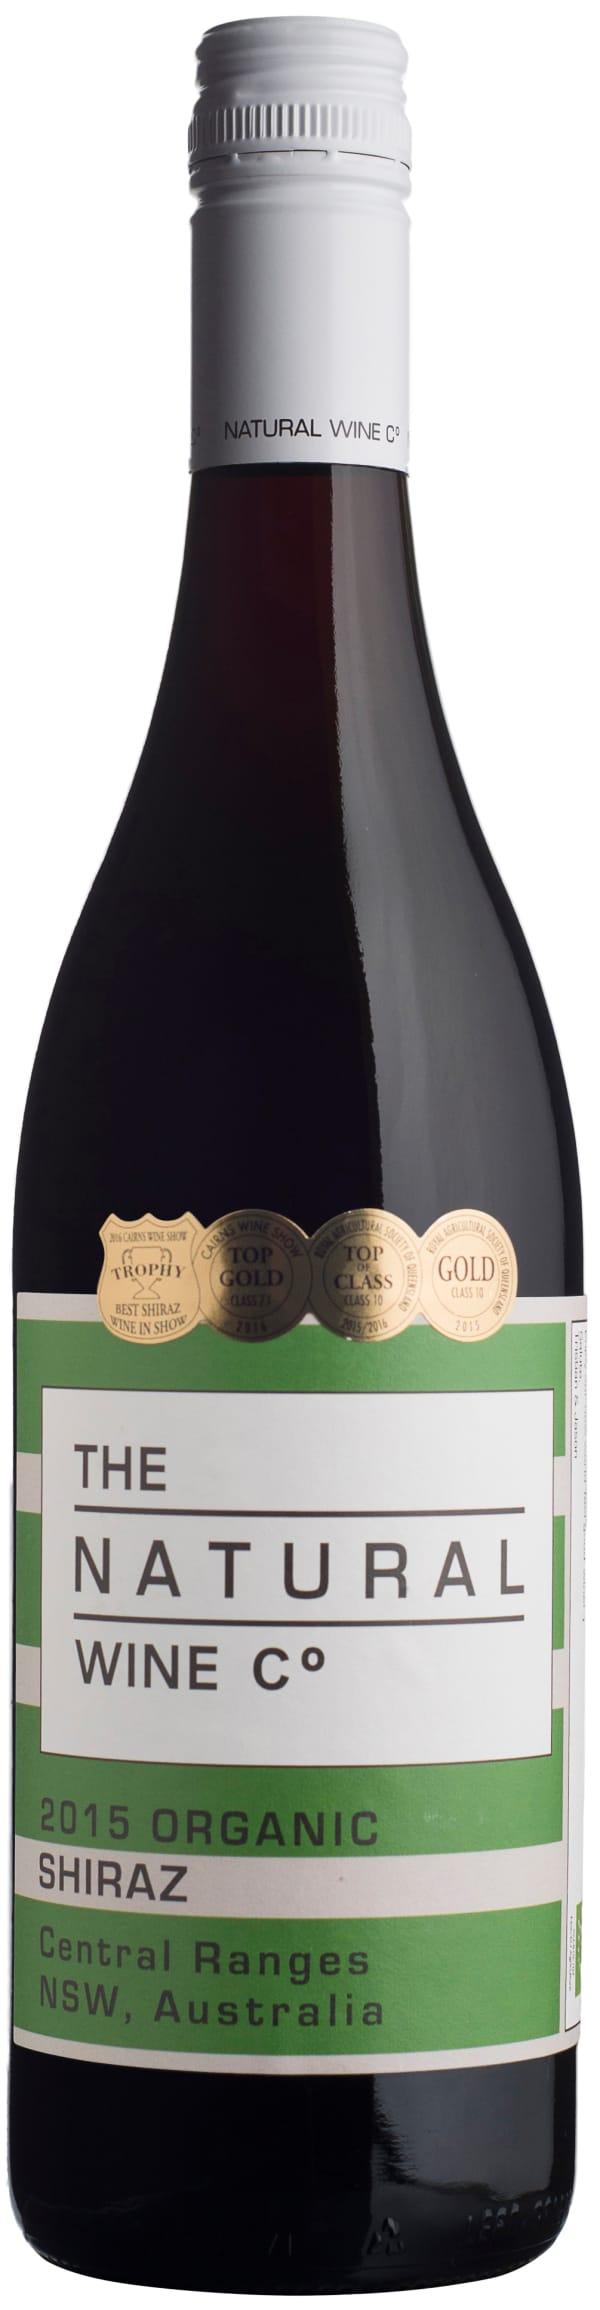 The Natural Wine Co Organic Shiraz 2016